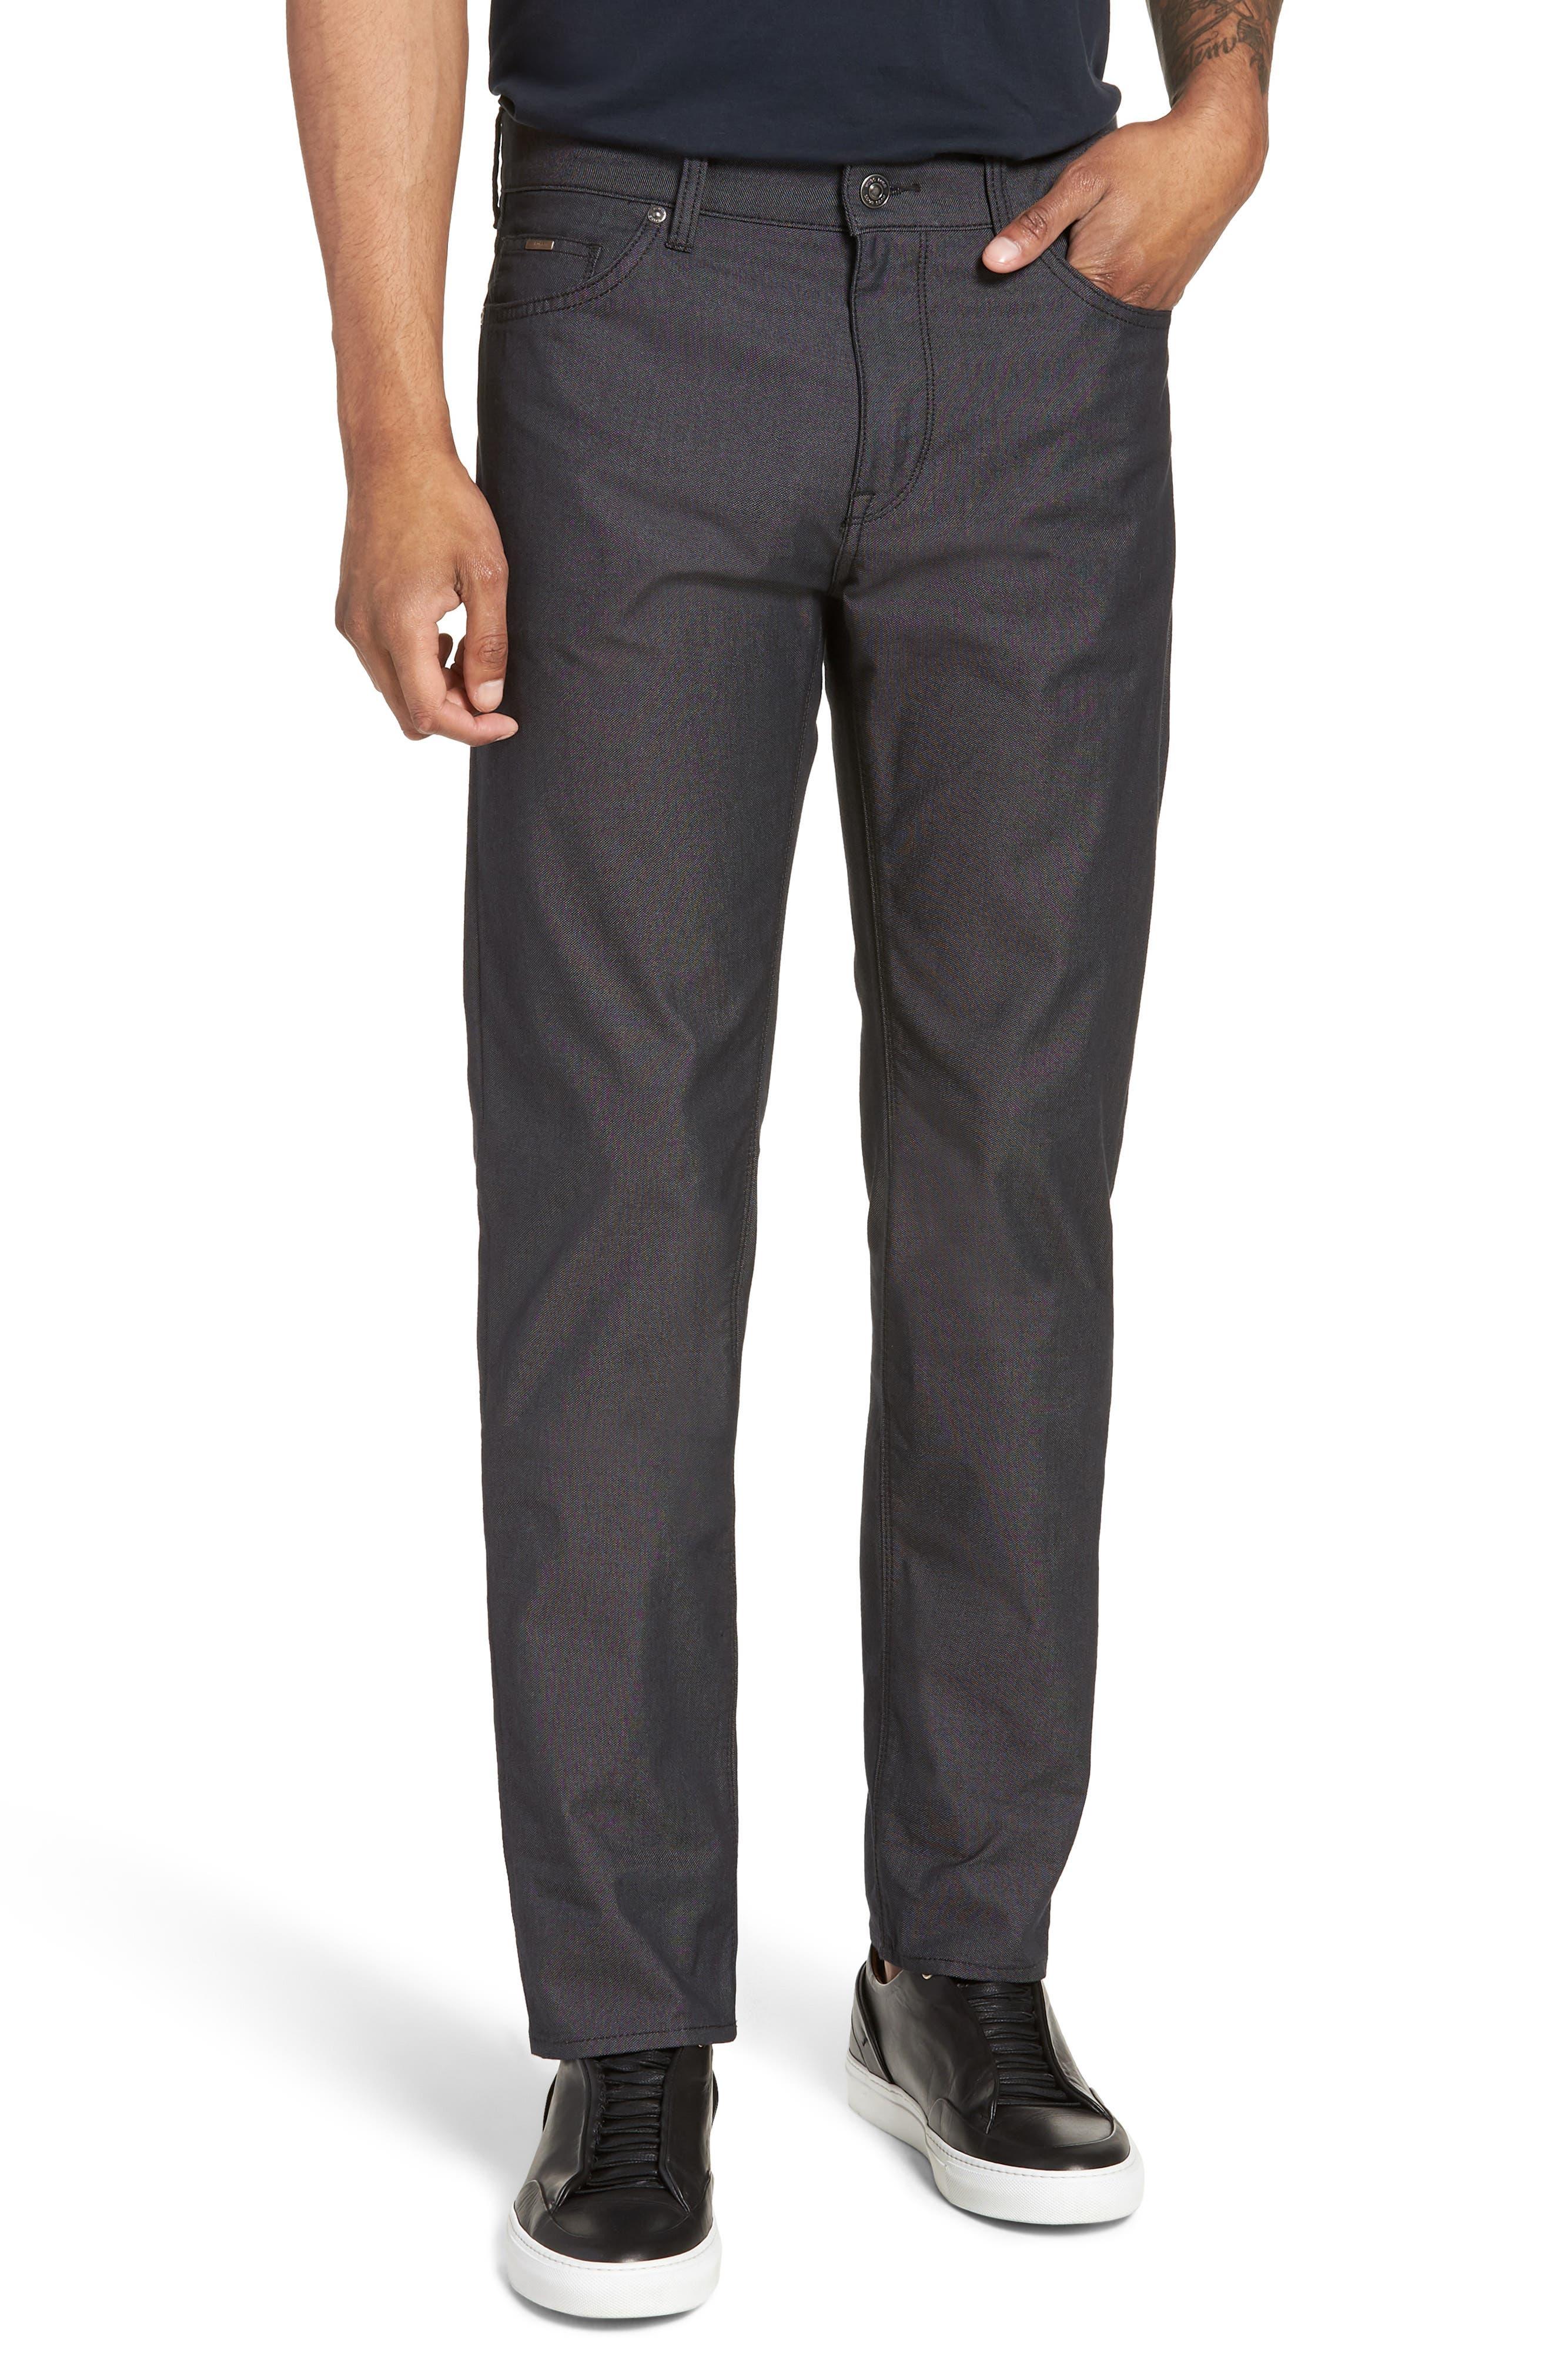 Maine Straight Leg Jeans,                         Main,                         color, Black